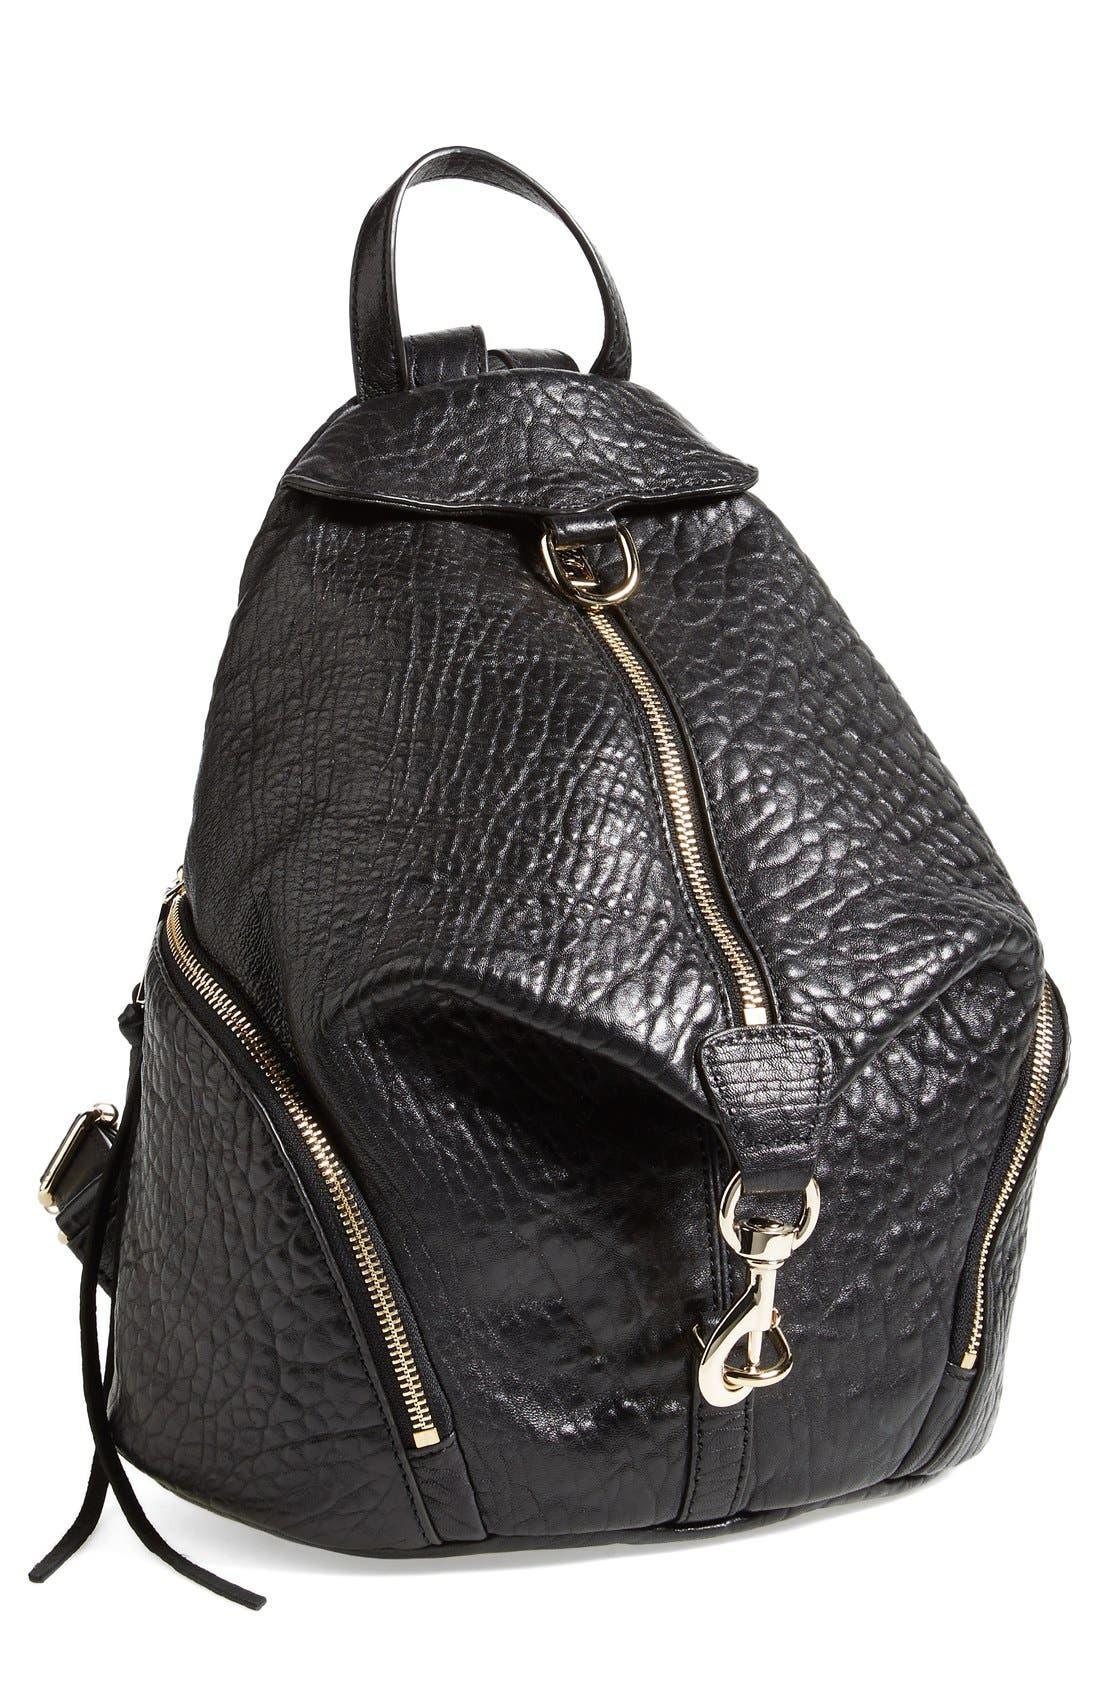 Alternate Image 1 Selected - Rebecca Minkoff 'Julian' Backpack